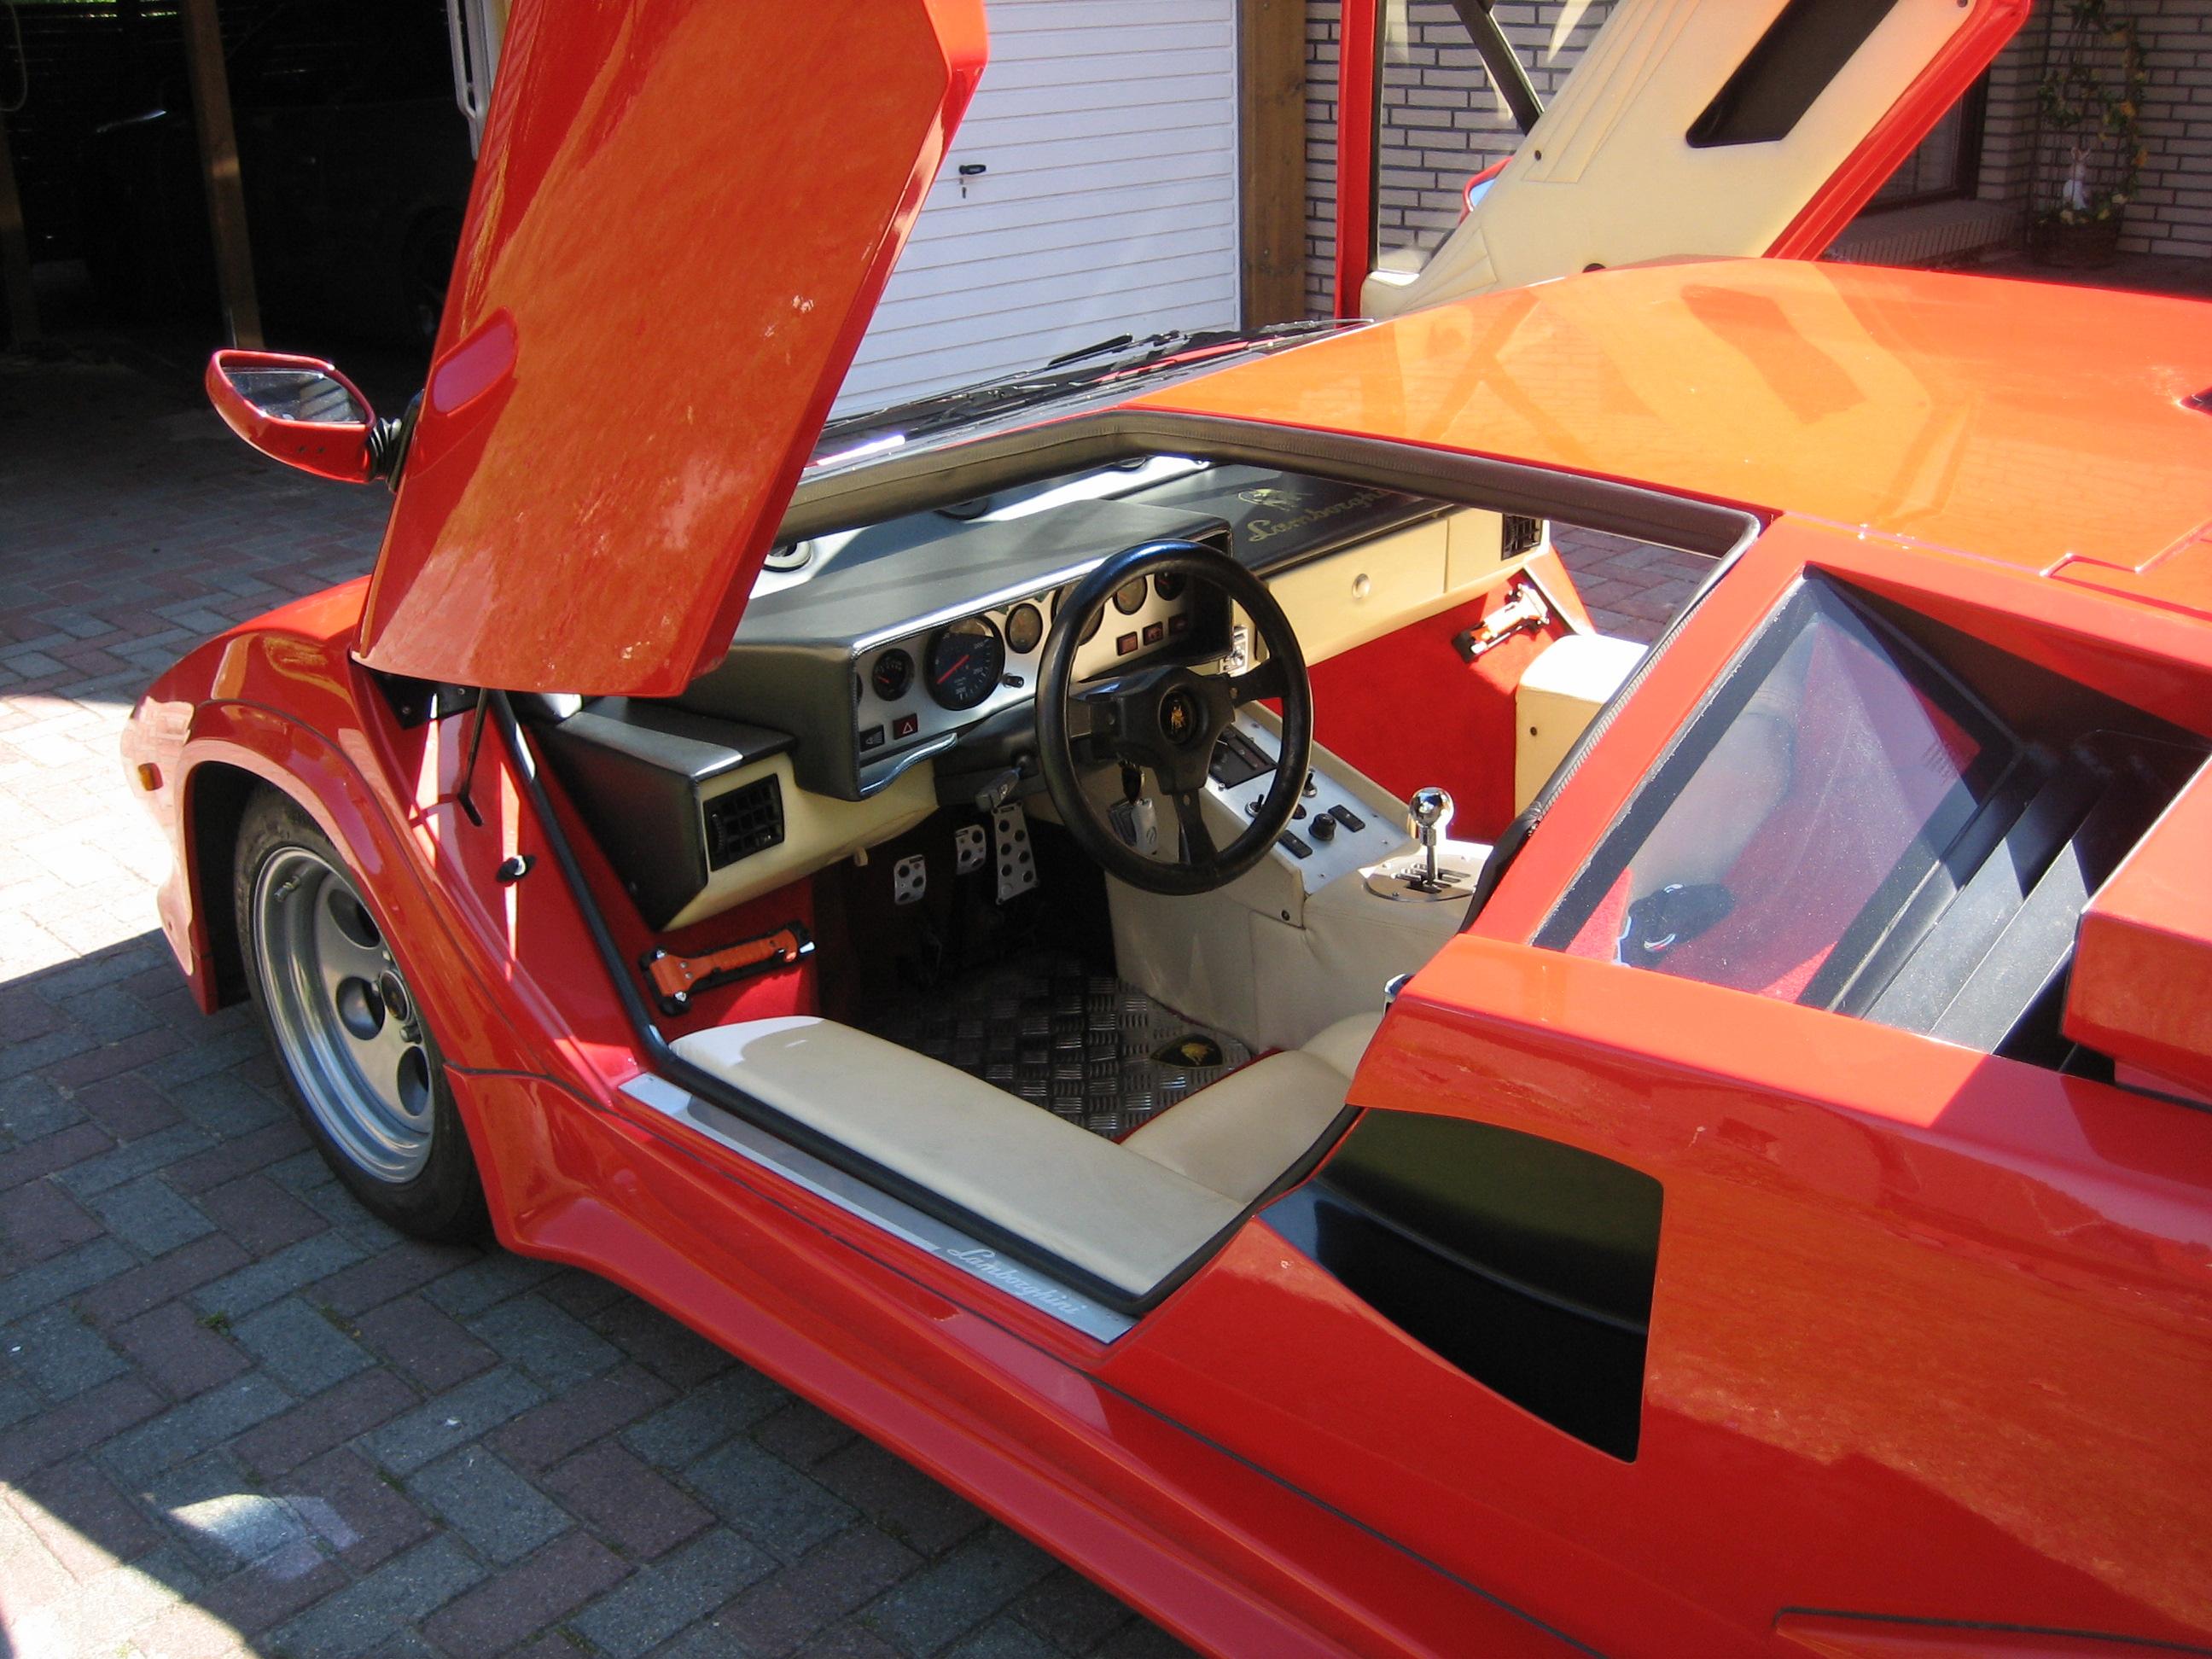 IMG_6526 Wonderful Lamborghini Countach Strohm De Rella Cars Trend